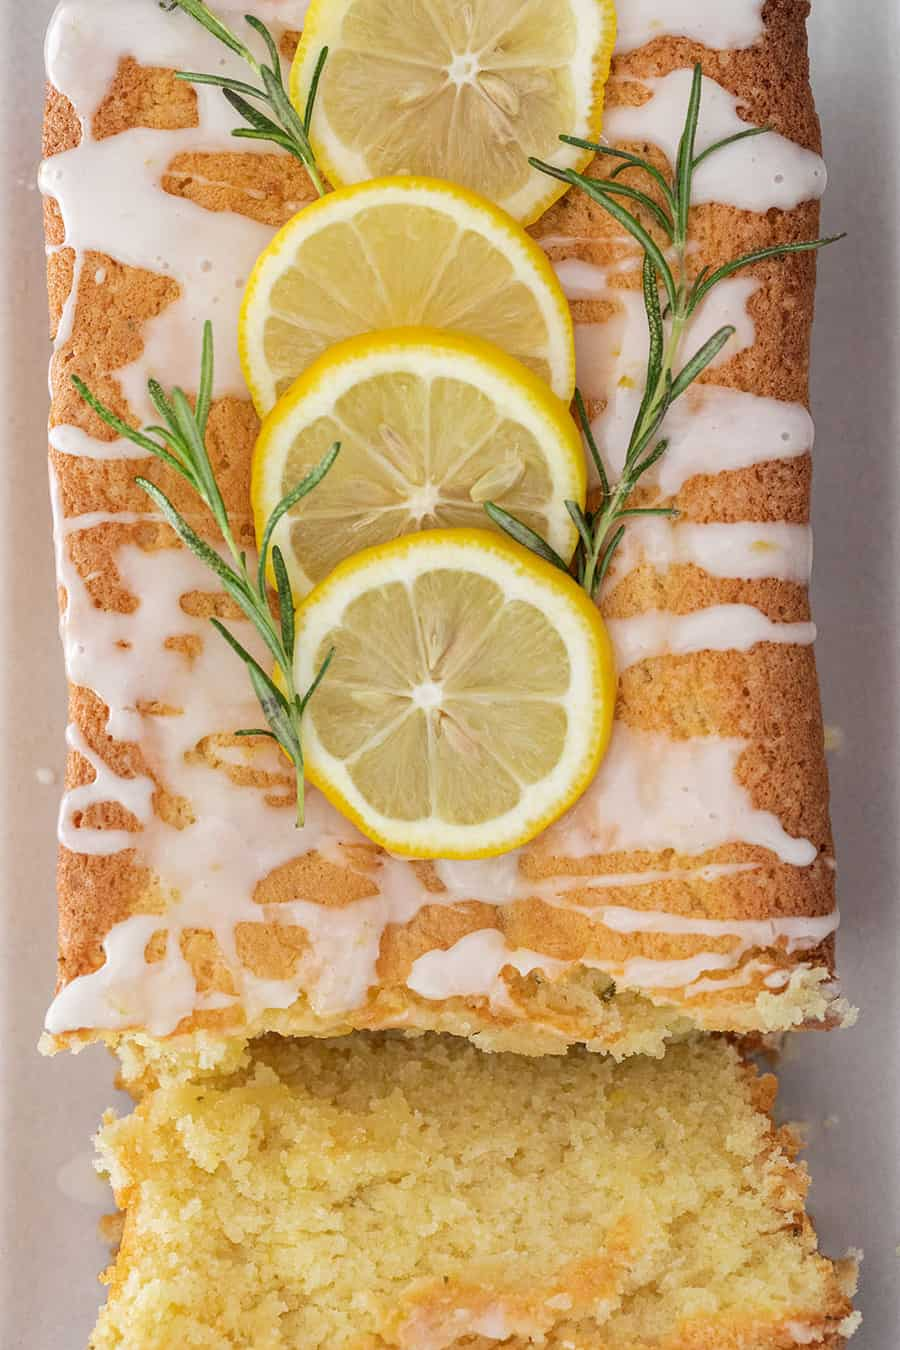 Rosemary Lemon Loaf cake cut with sliced lemon and fresh rosemary.